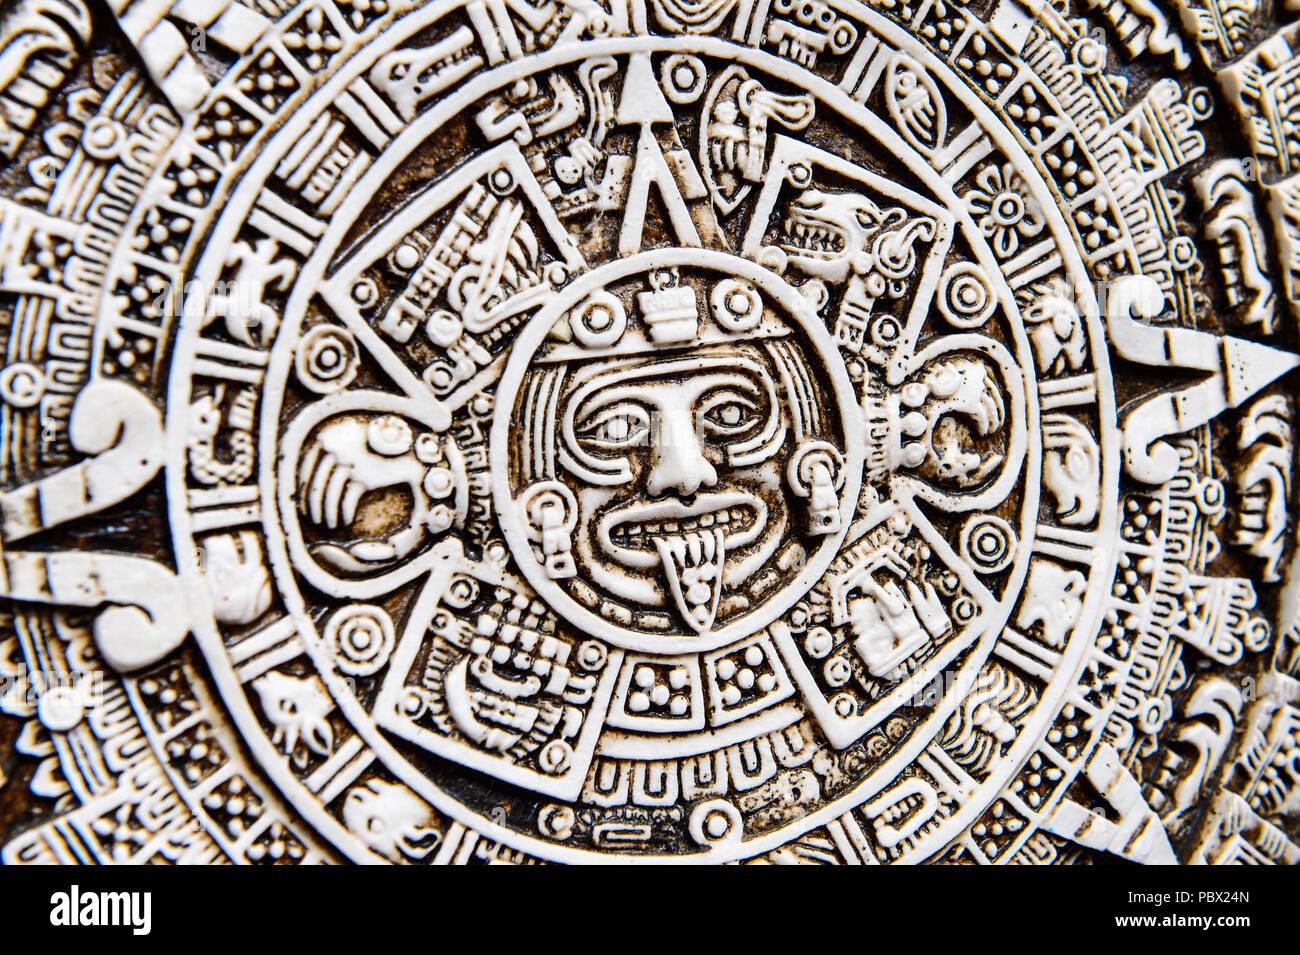 Calendrier Maya Dessin.Maya Calendar Photos Maya Calendar Images Page 3 Alamy